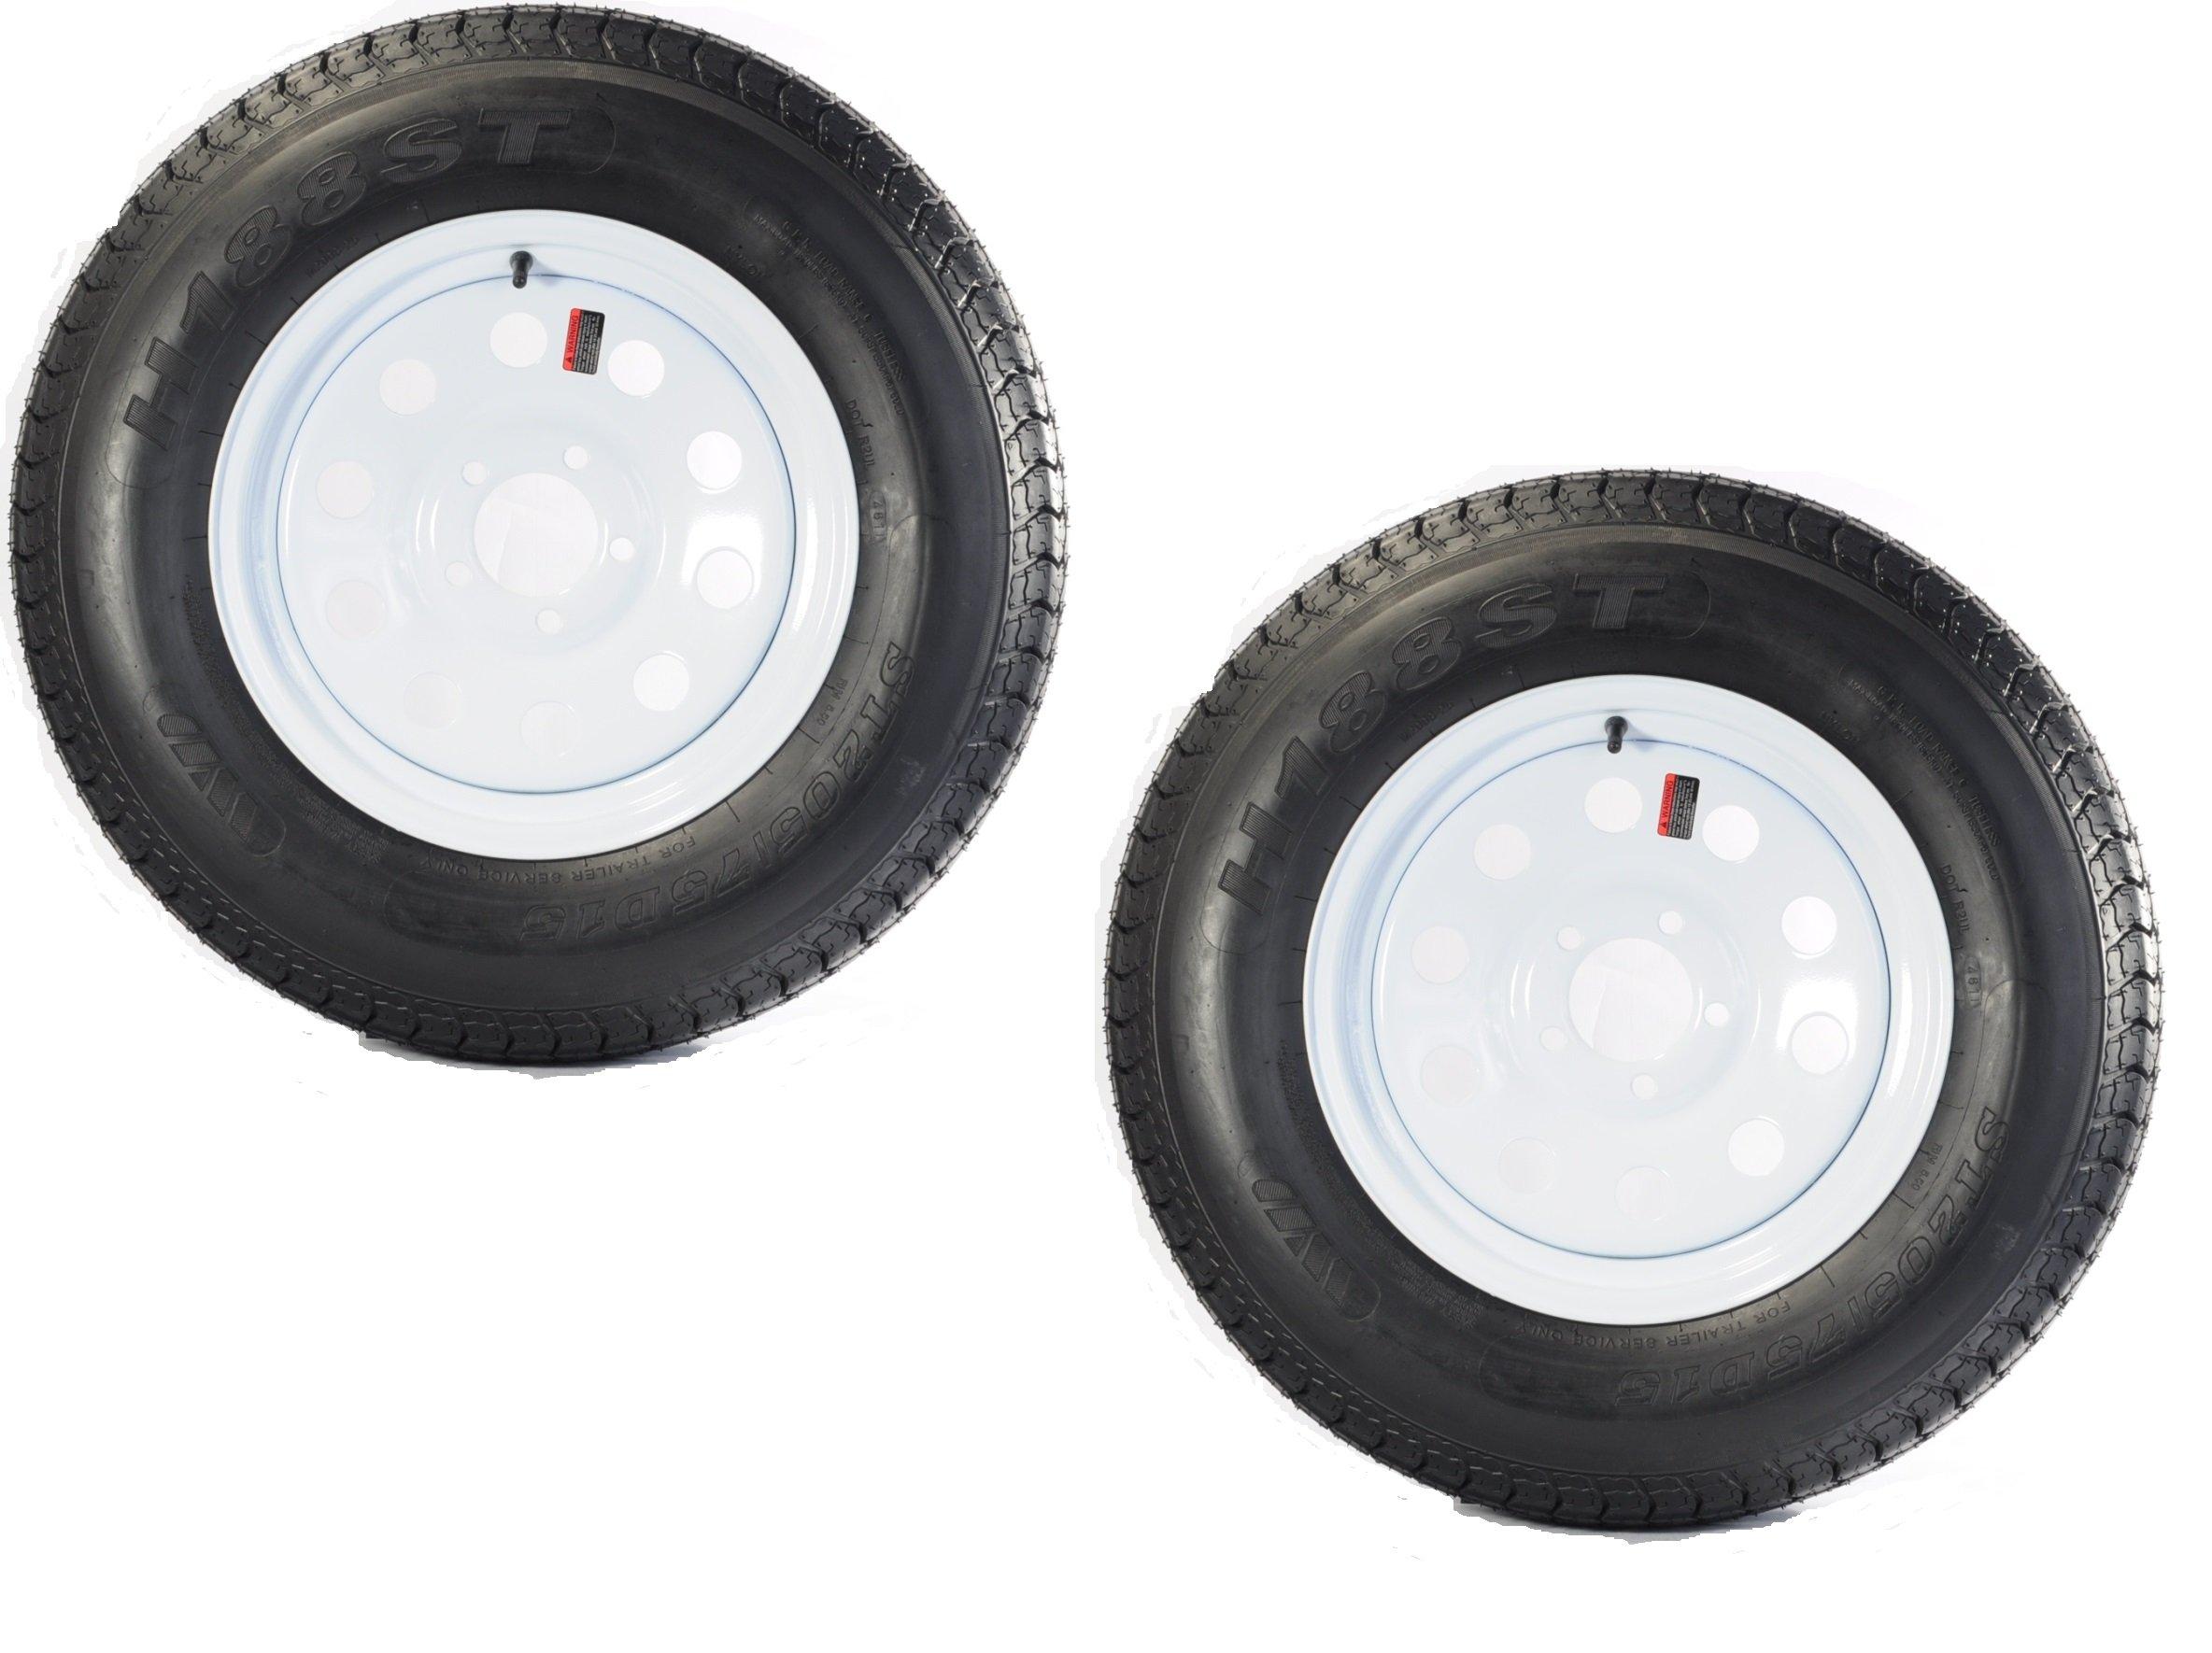 2 Heavy Duty Trailer Tires & Rims ST205/75D15 205/75-15 LRD 5 Lug White Modular